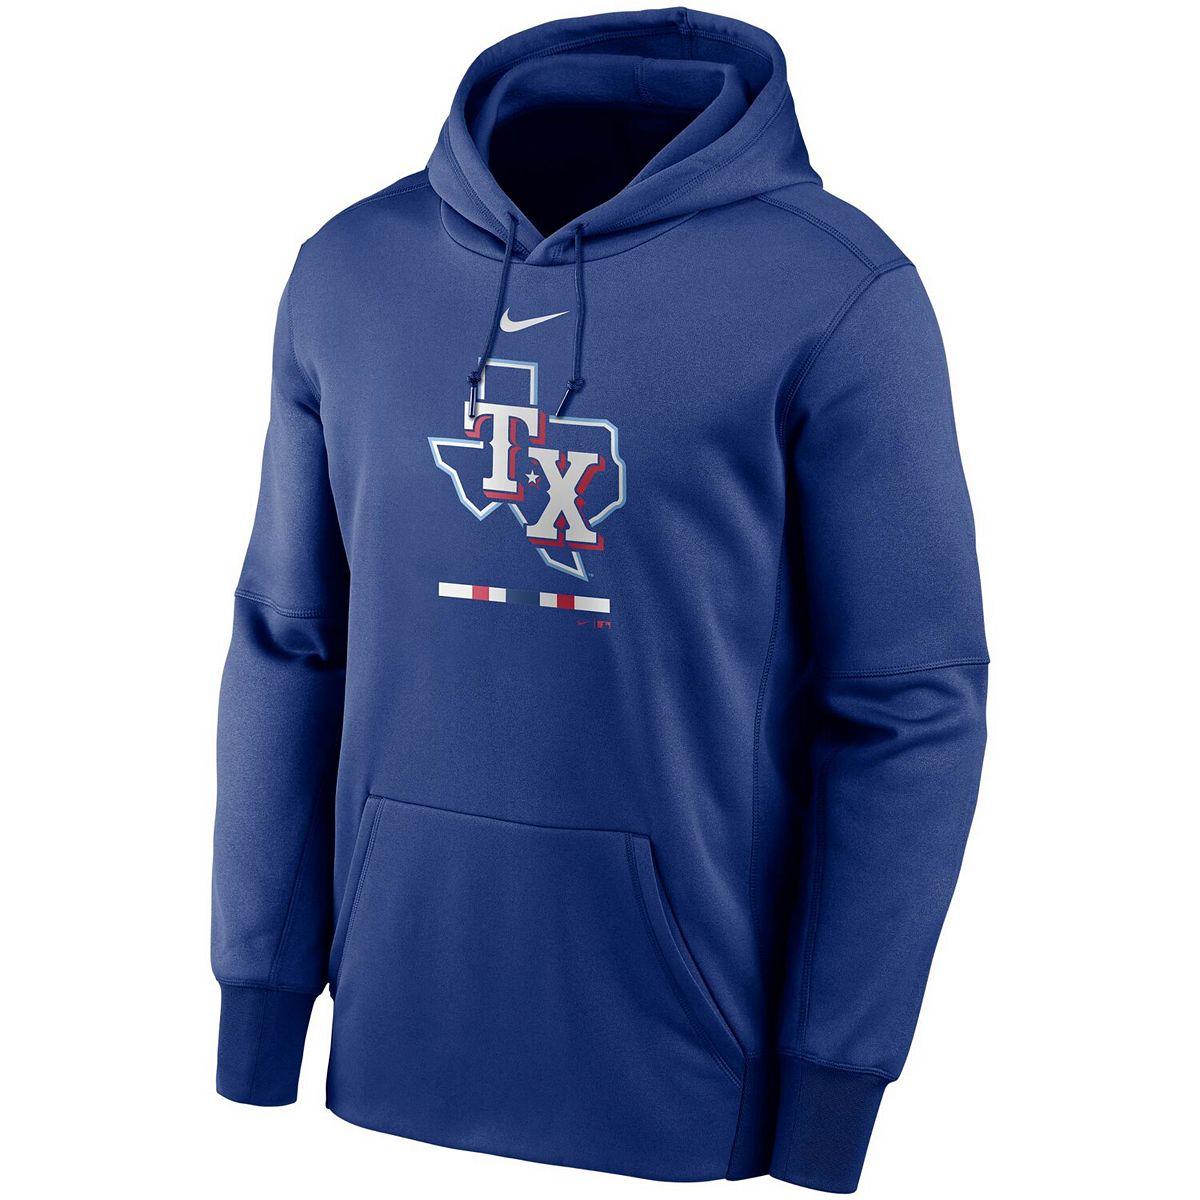 Men's Nike Royal Texas Rangers Legacy Performance Pullover Hoodie Gjbf5